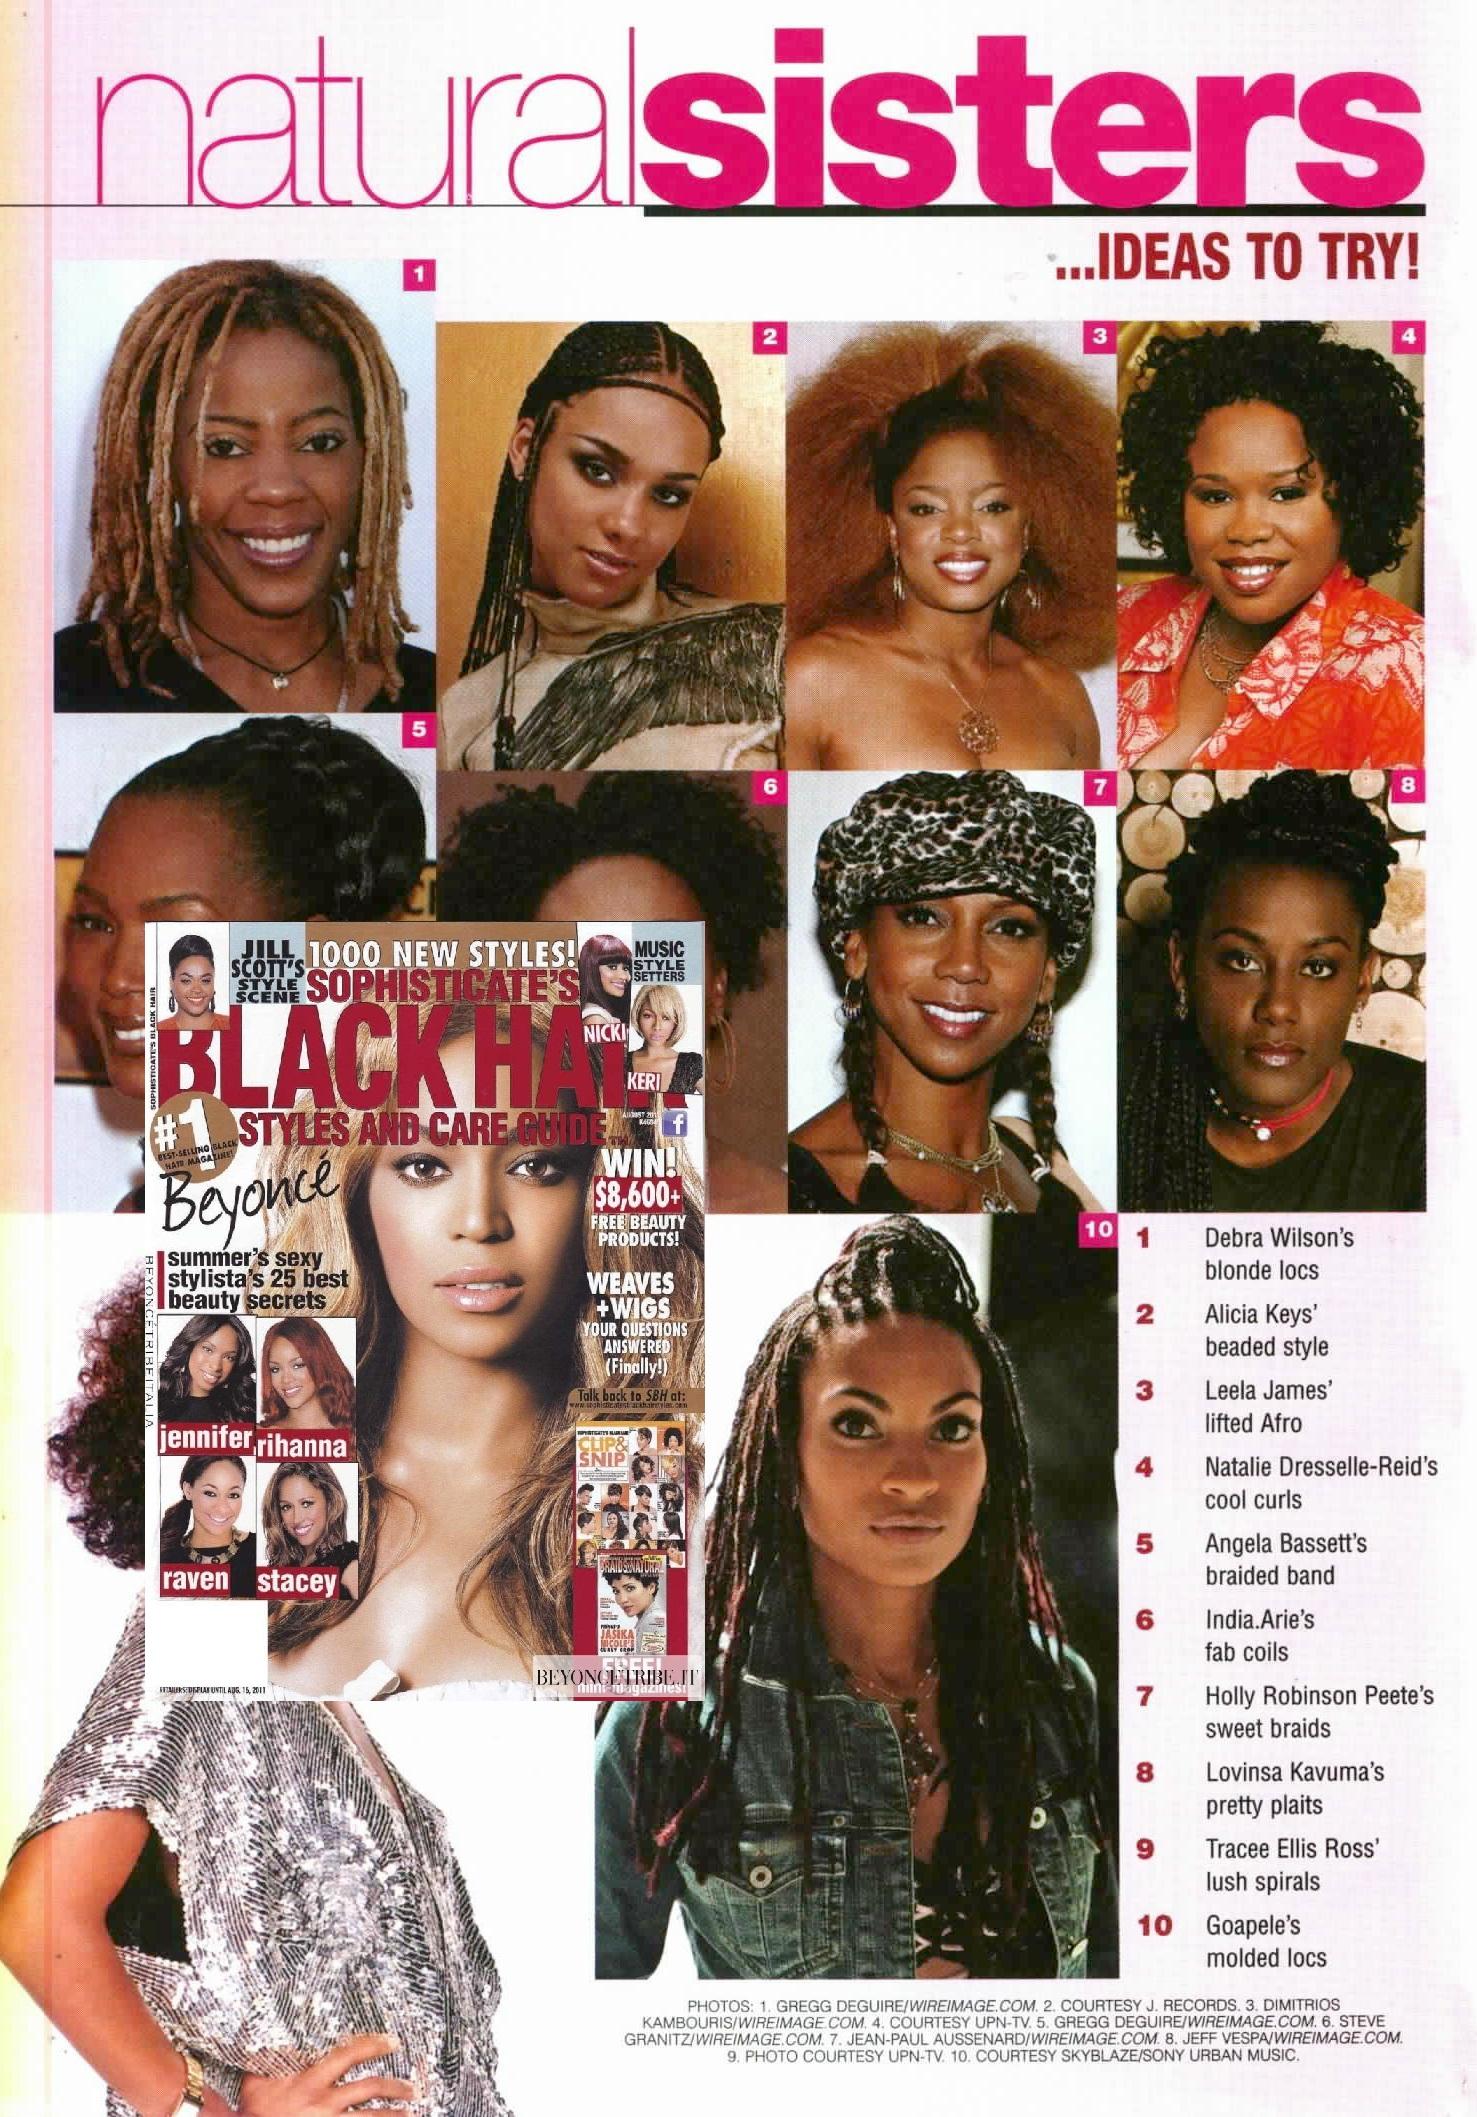 SOPHISTICATE'S BLACK HAIR